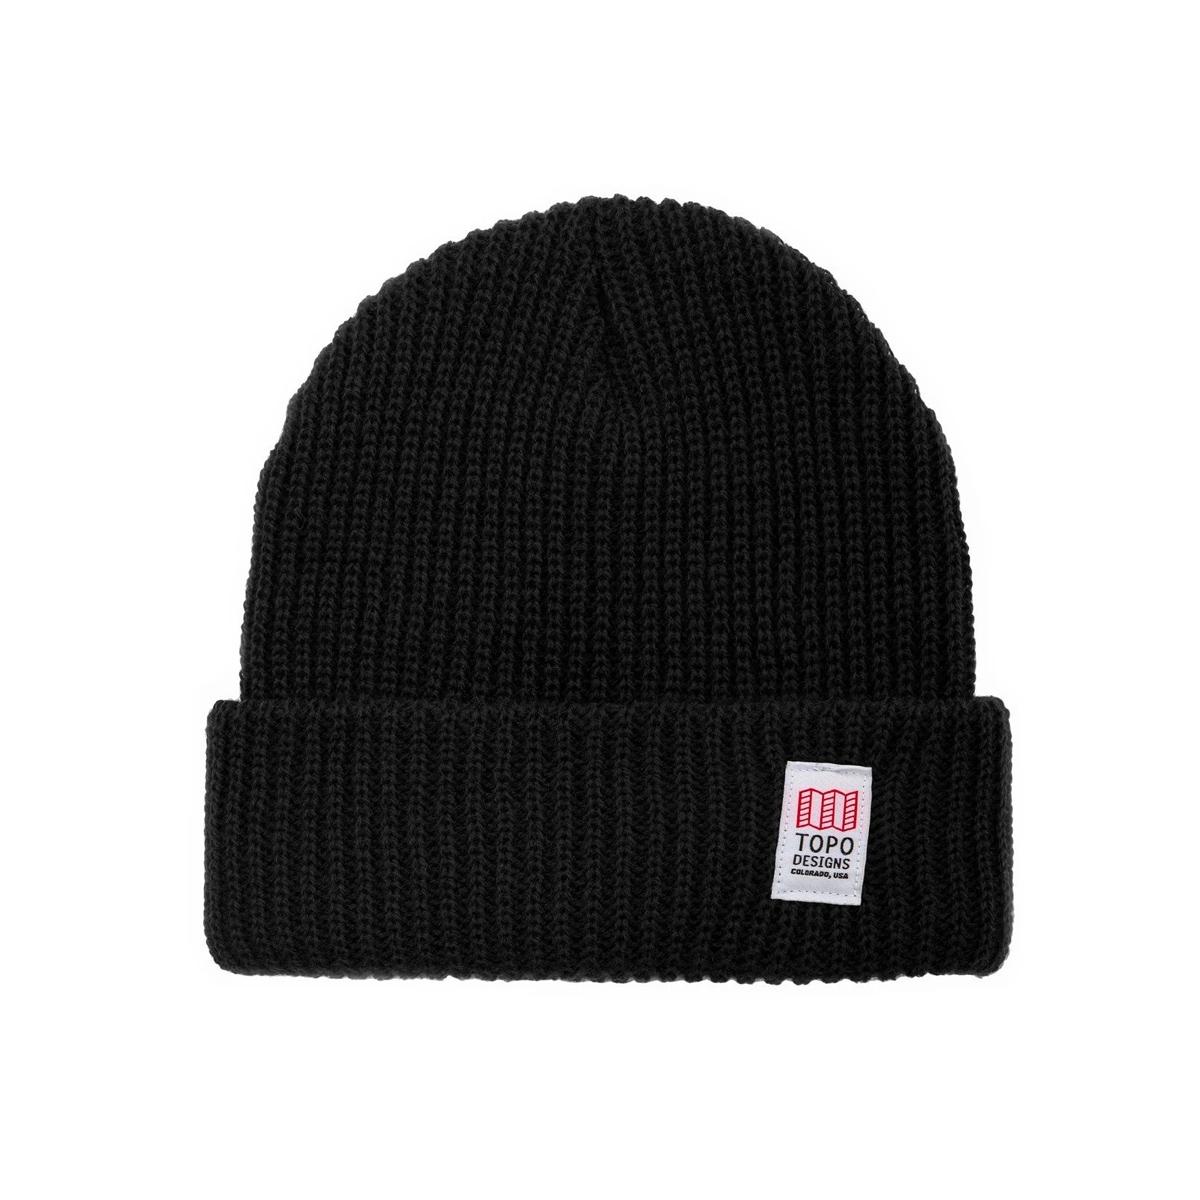 Topo Designs Watch Cap Black